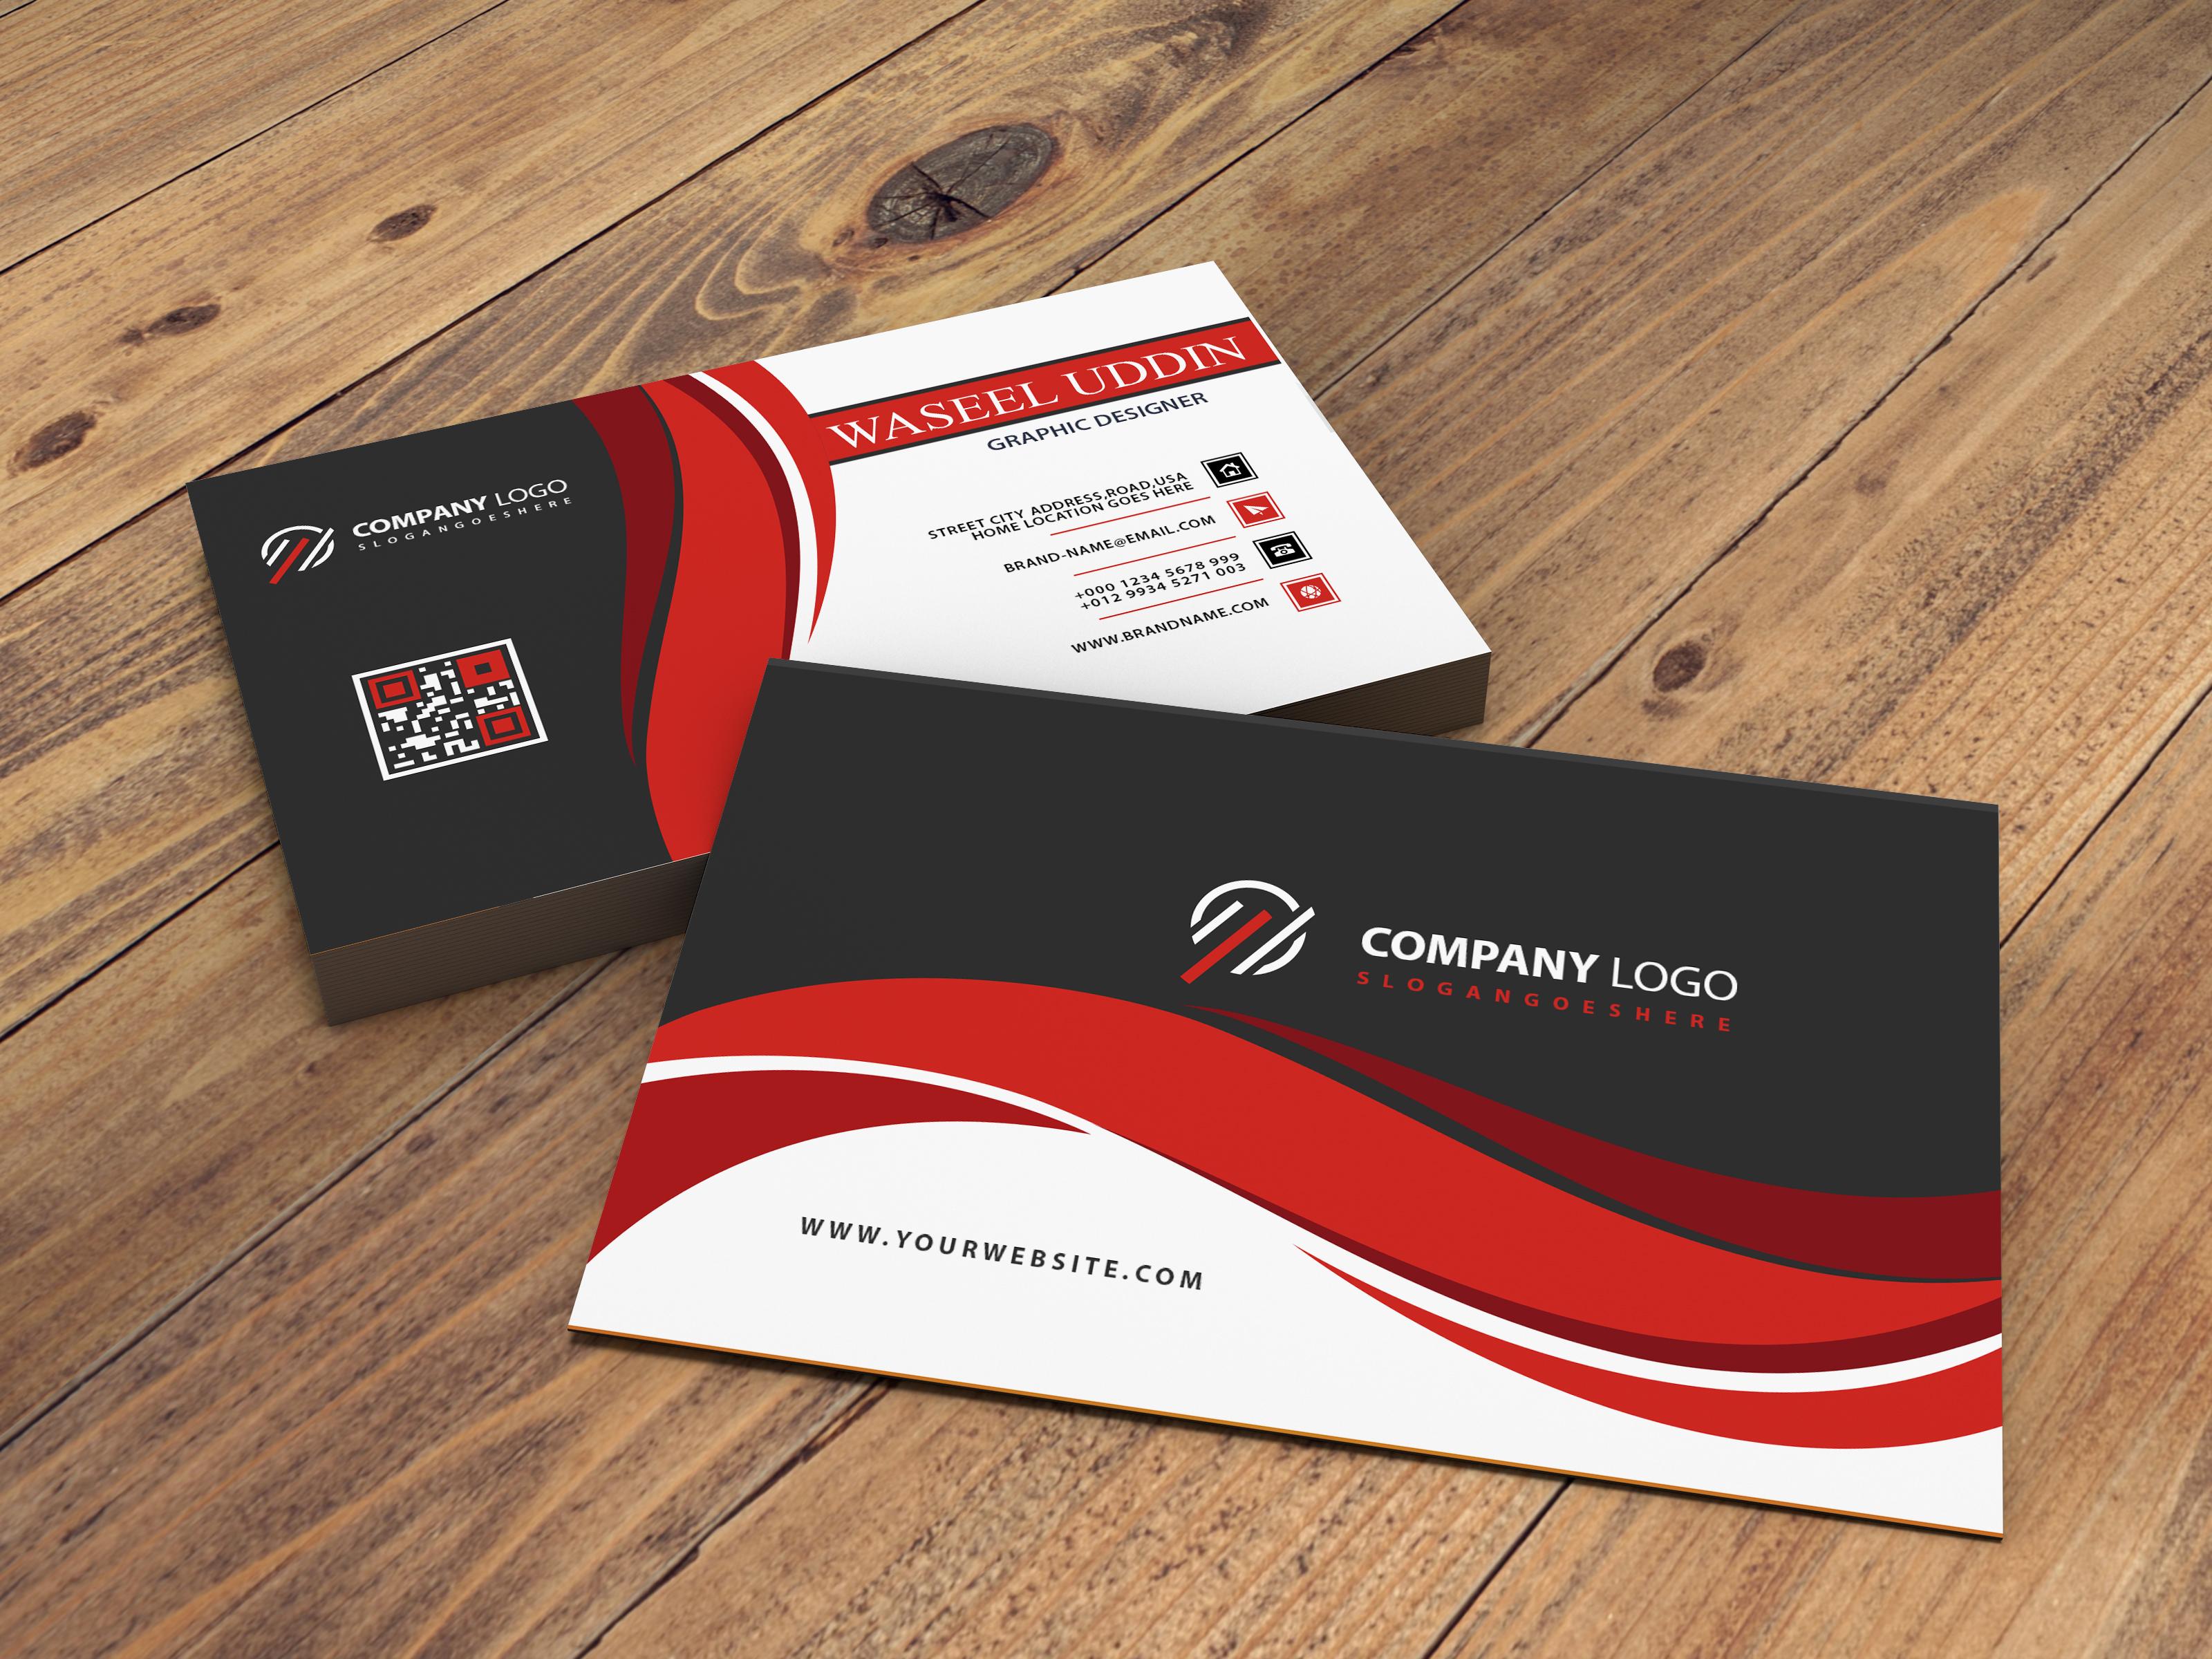 Design A Professional Business Card.